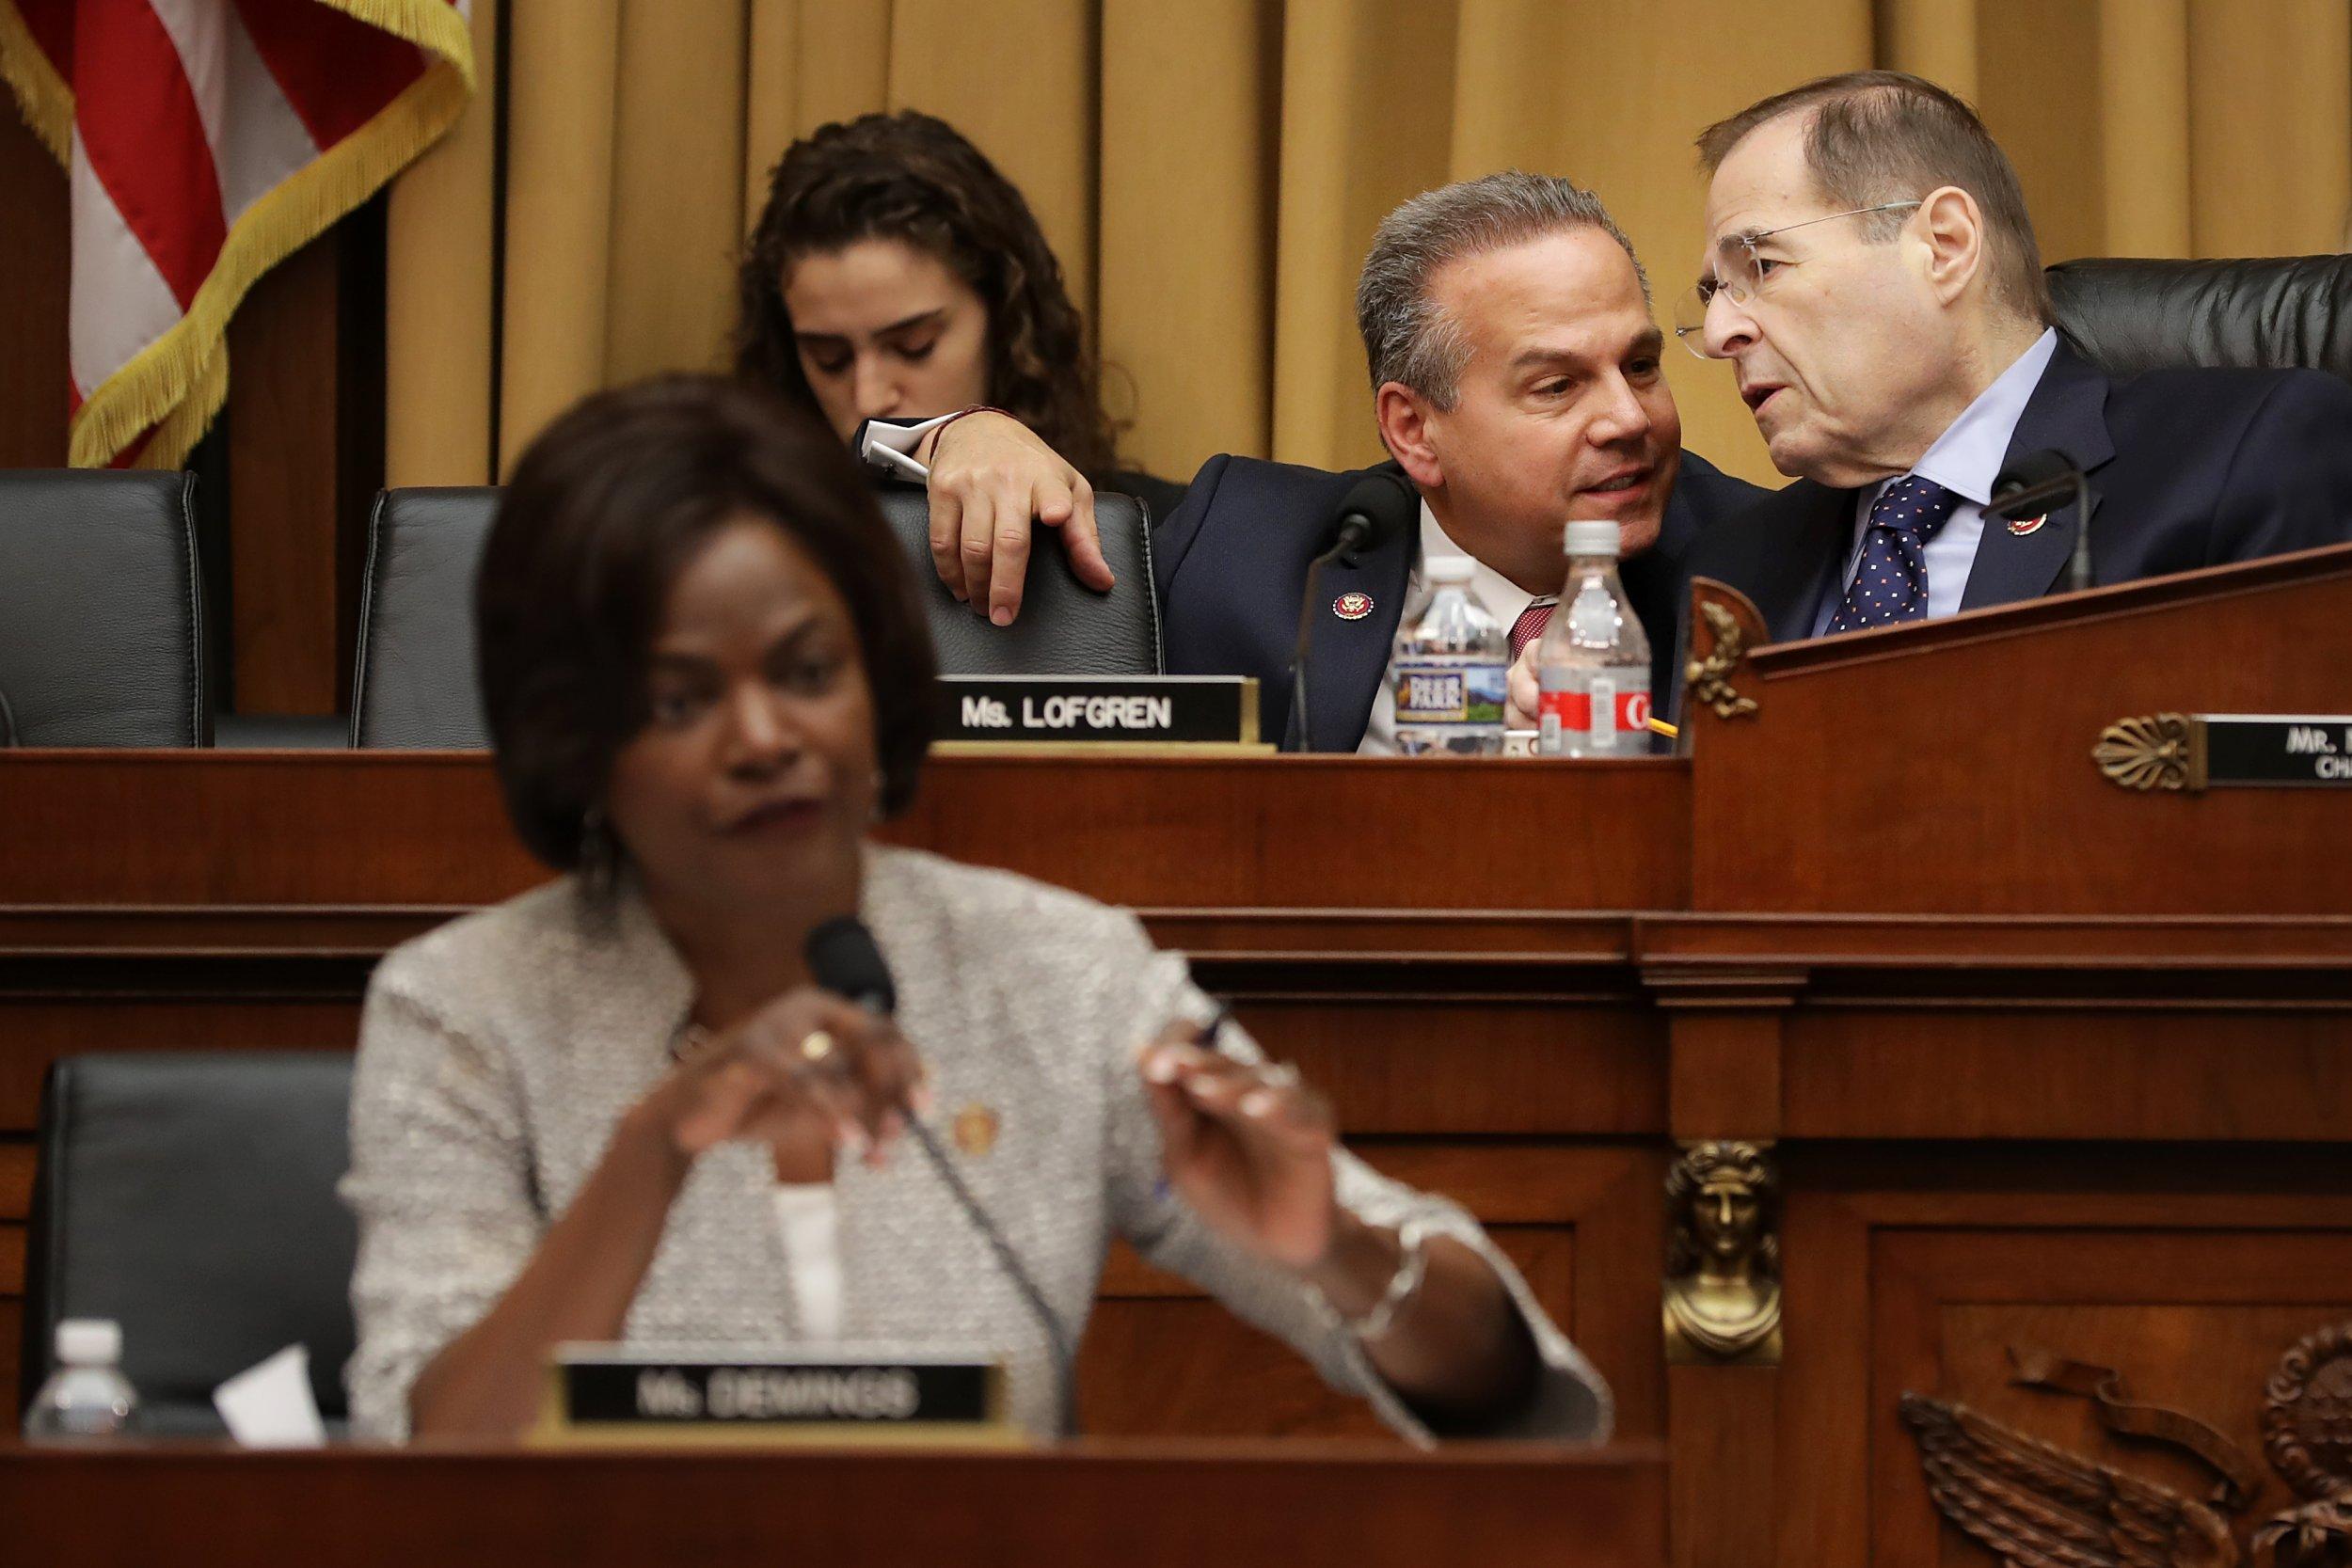 Key Democrats moving closer to impeachment, trump stonewalling